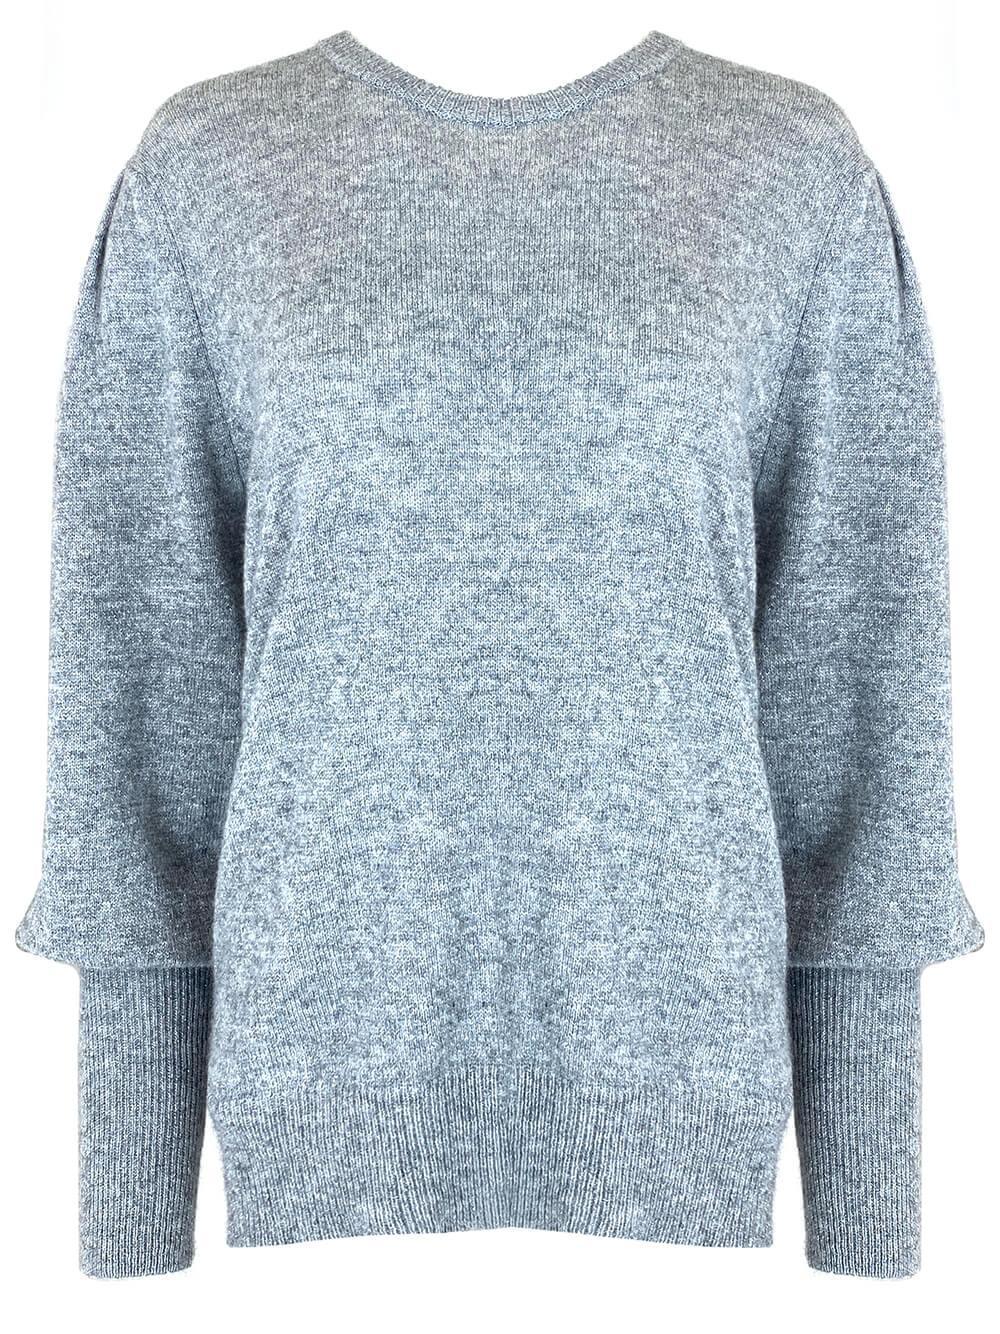 Shae Sparkle Crew Sweater